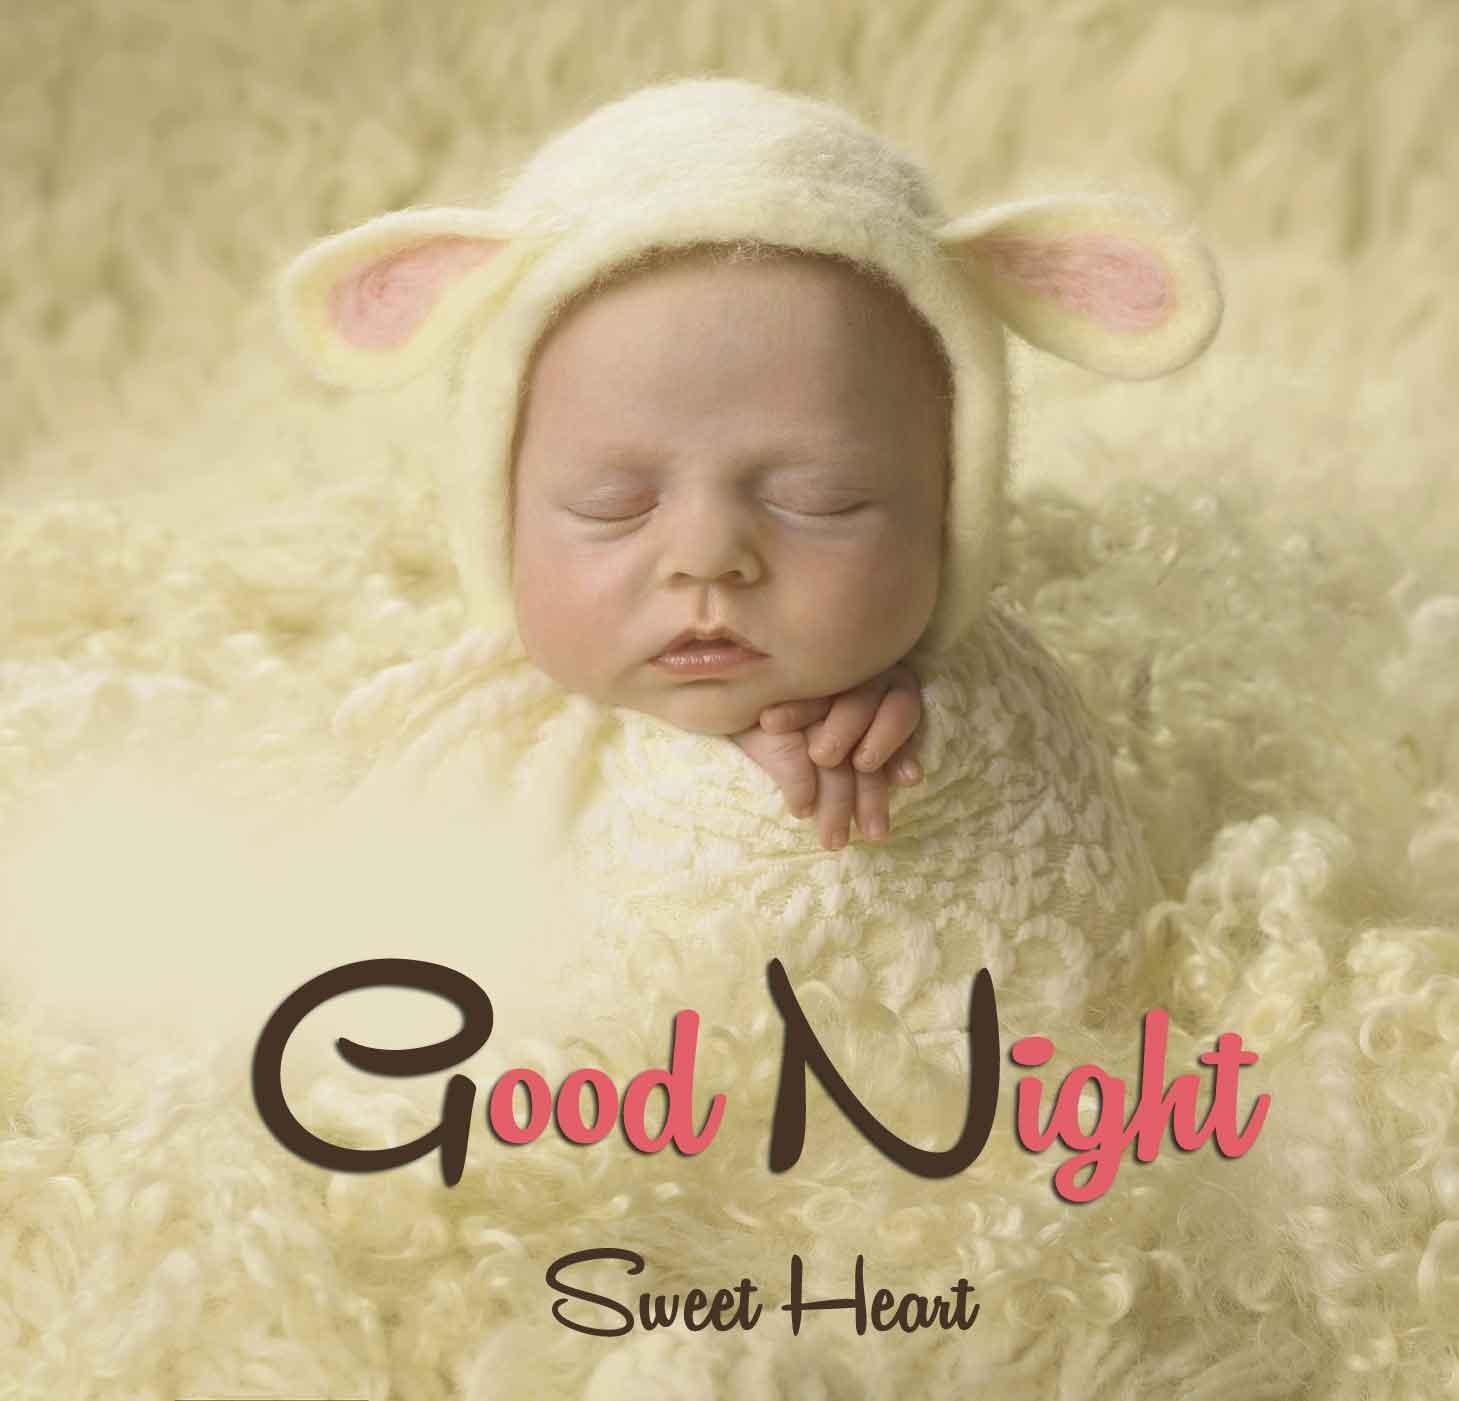 2021 Beautiful Cute Good Night Images 2